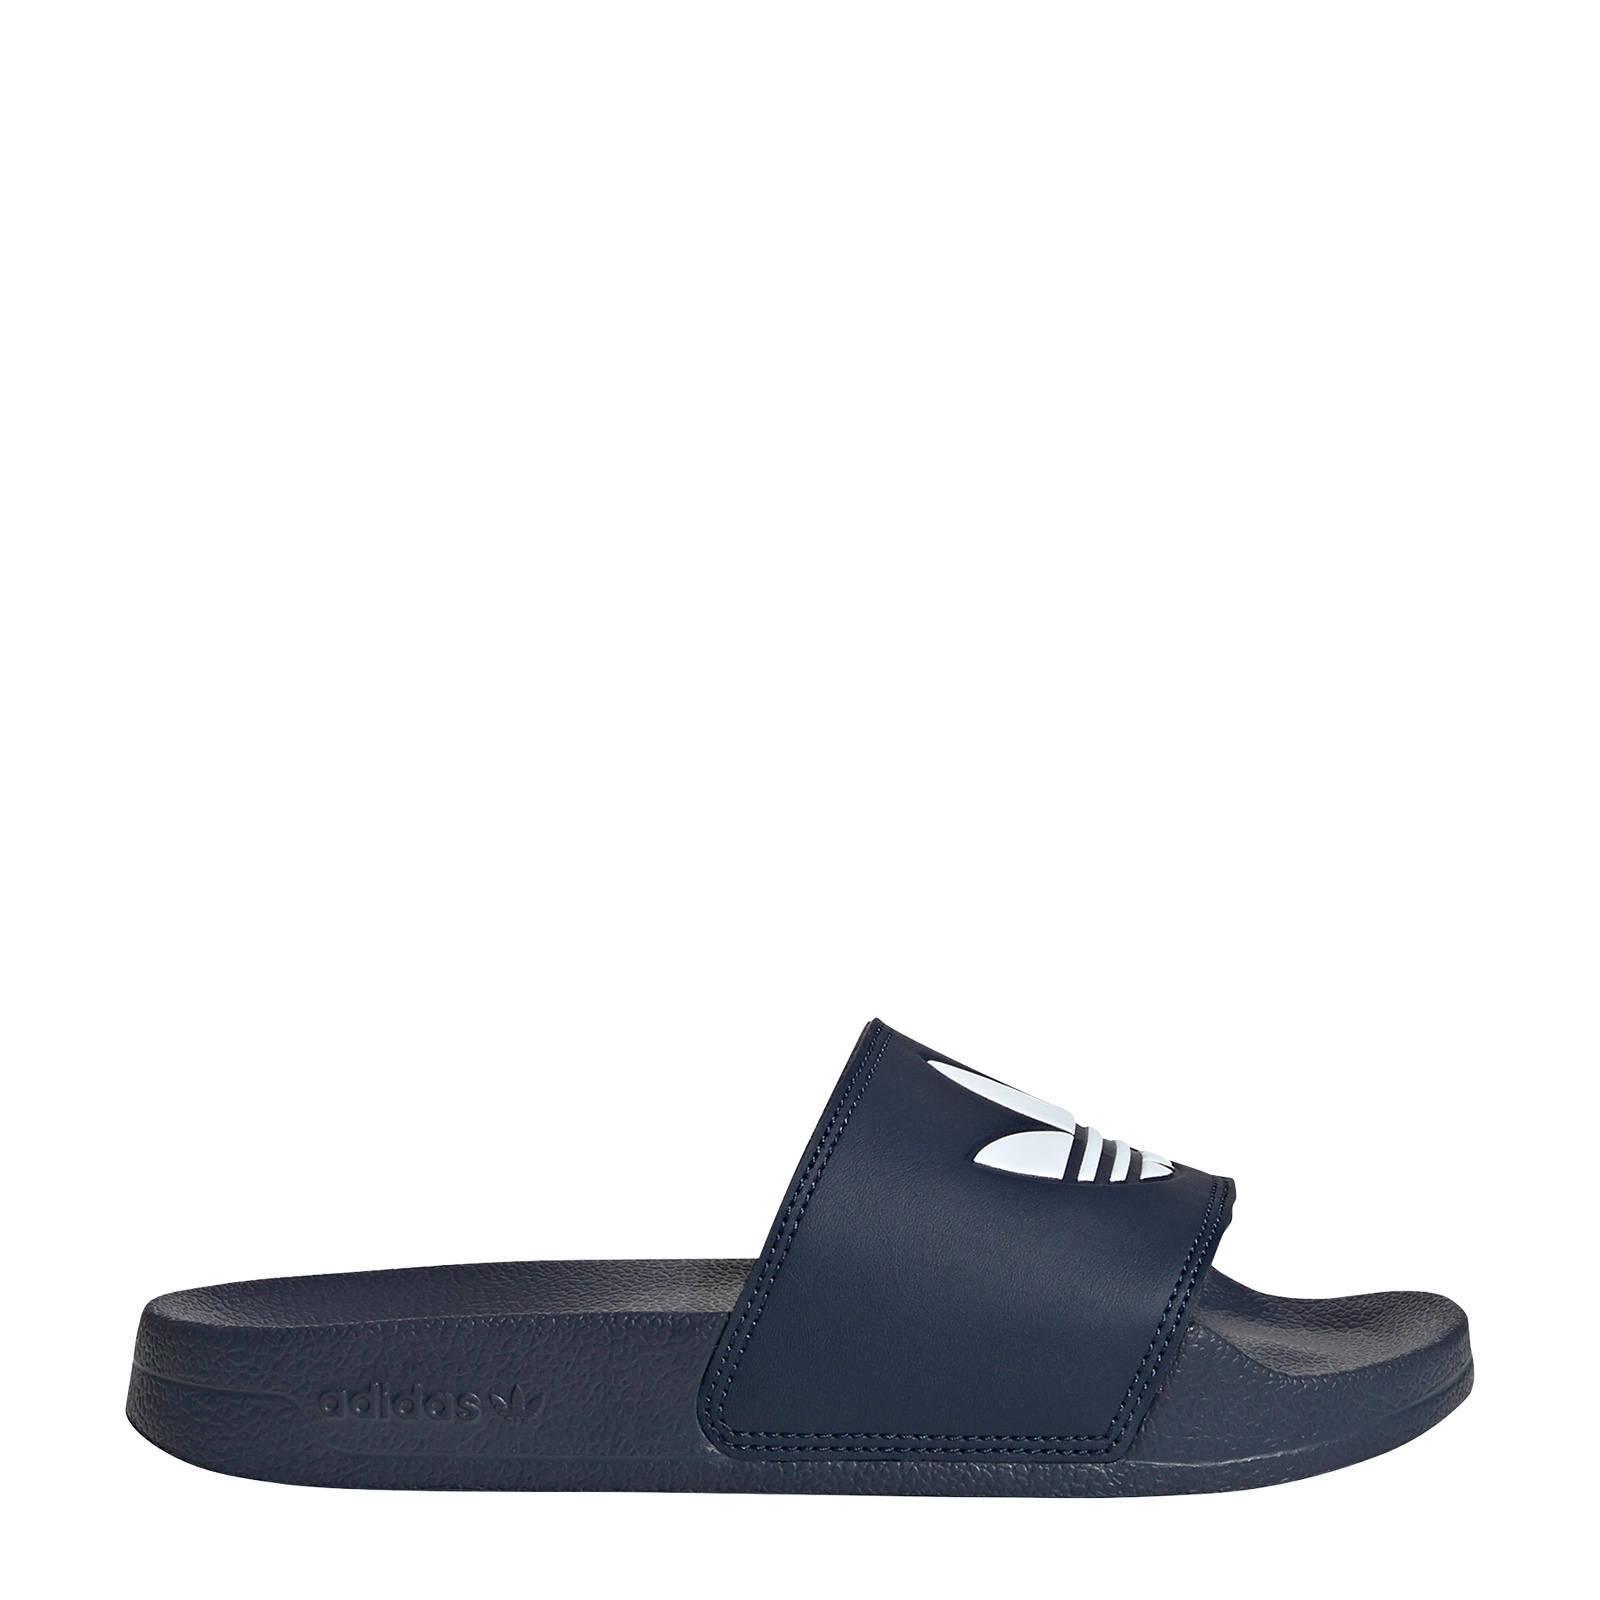 adidas Originals Adilette Lite badslippers donkerblauwwit